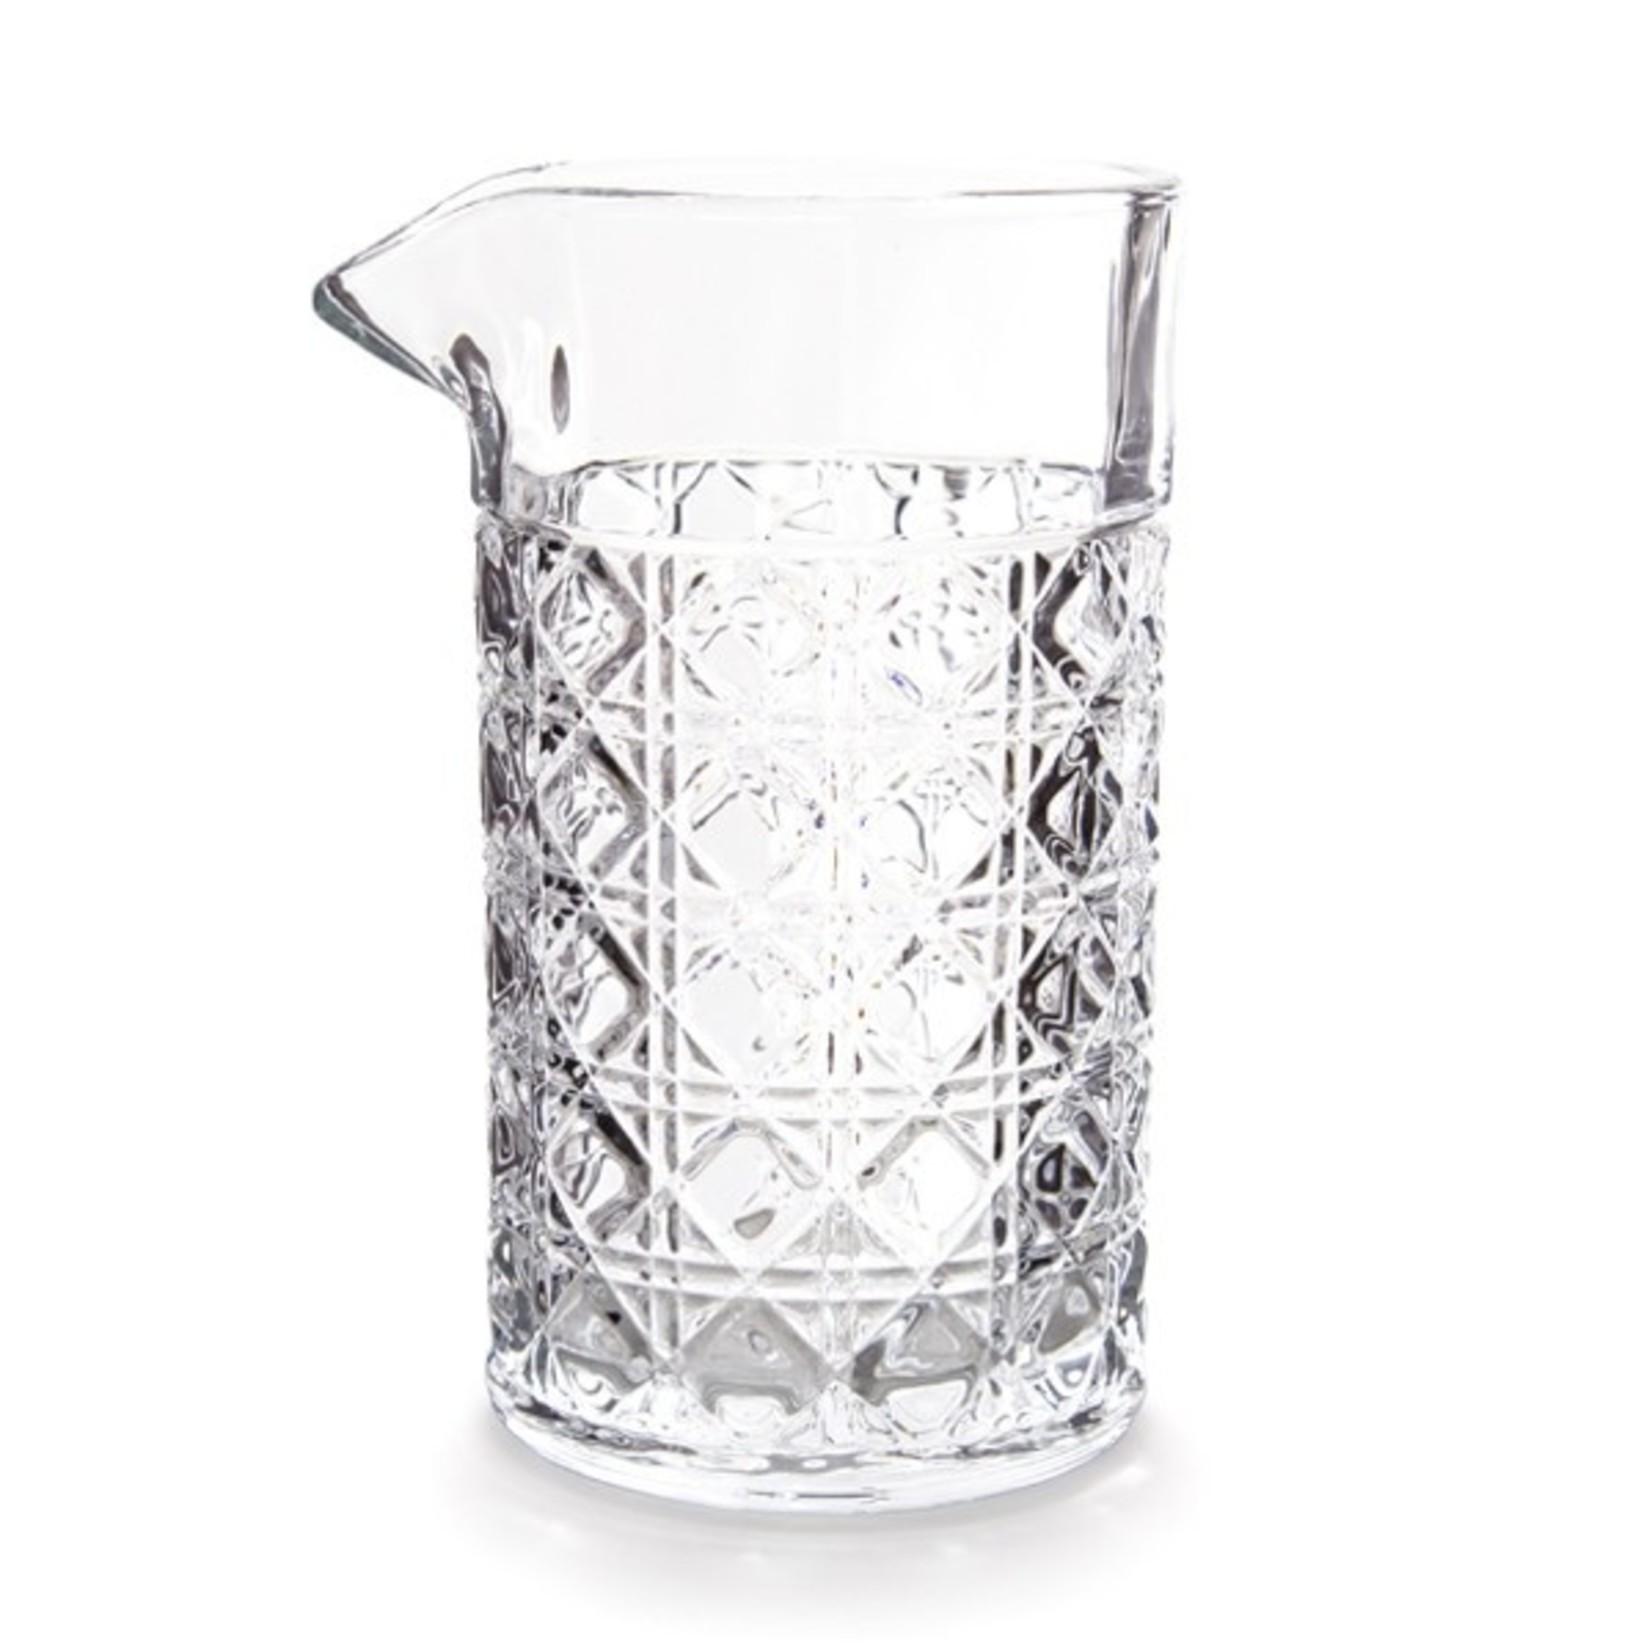 Cocktail Kingdom Sokata Mixing Glass Large